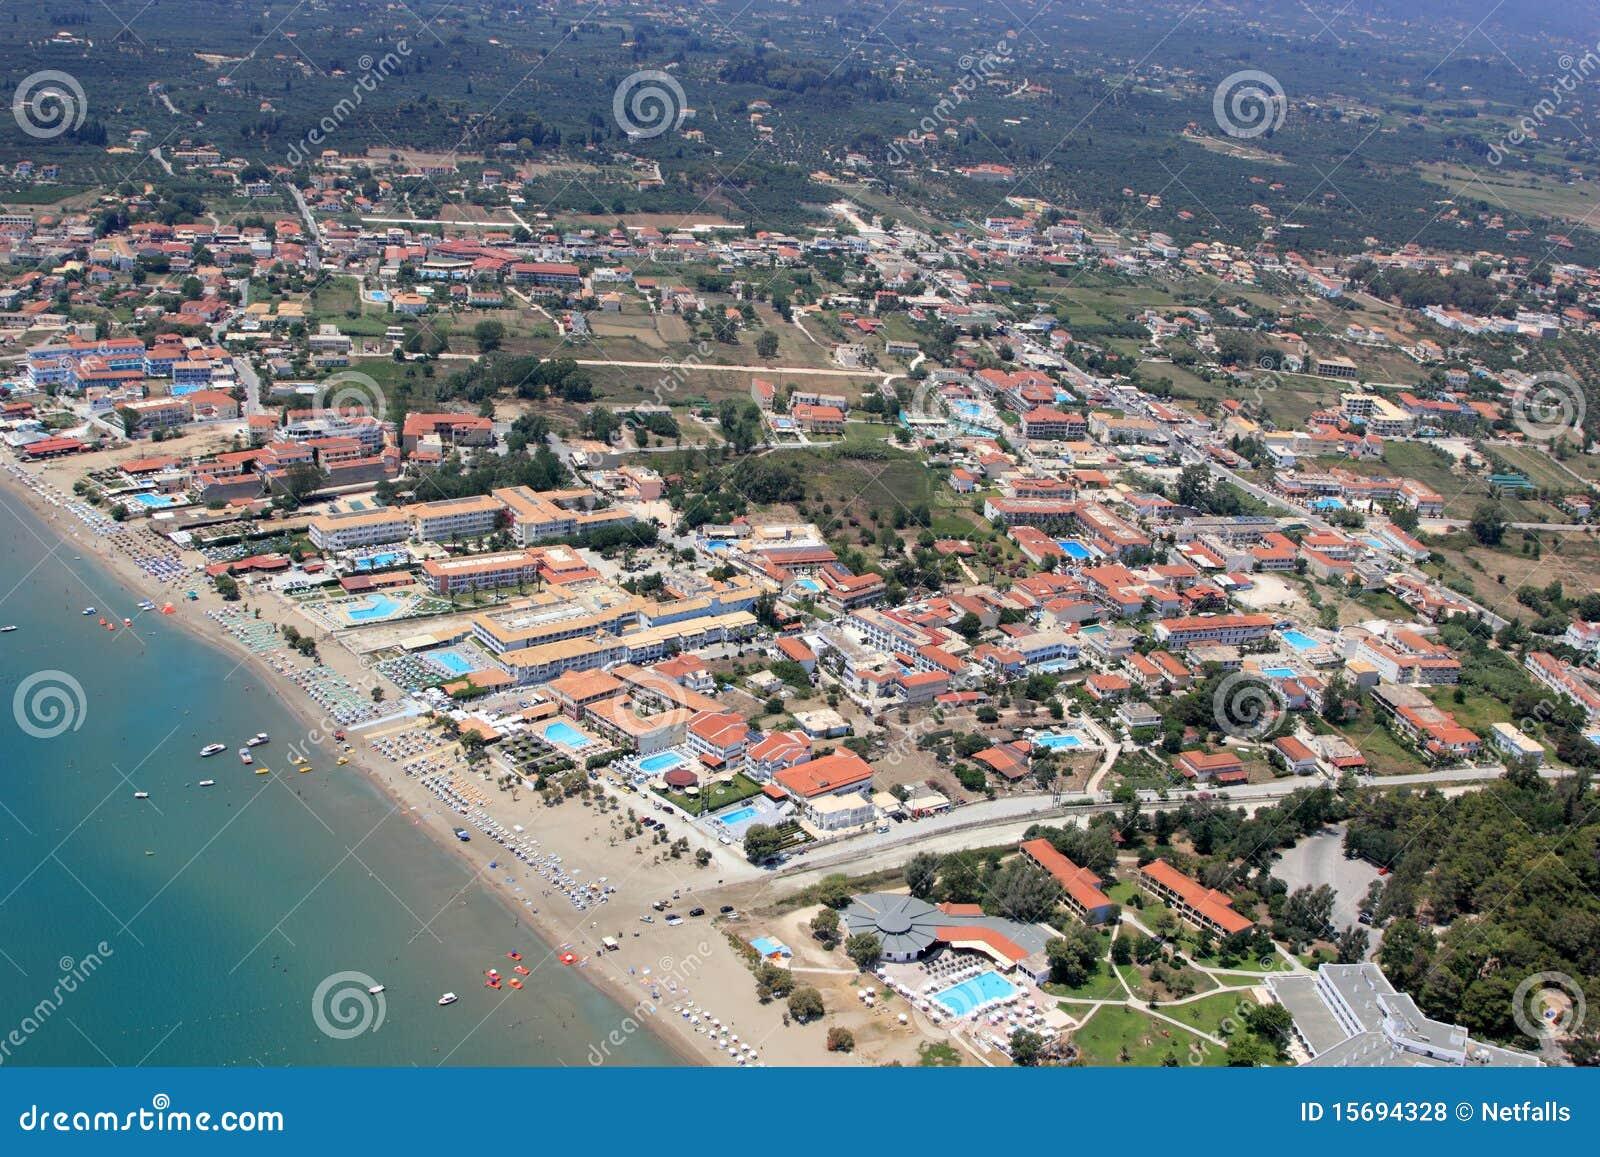 Overview on Zakynthos island